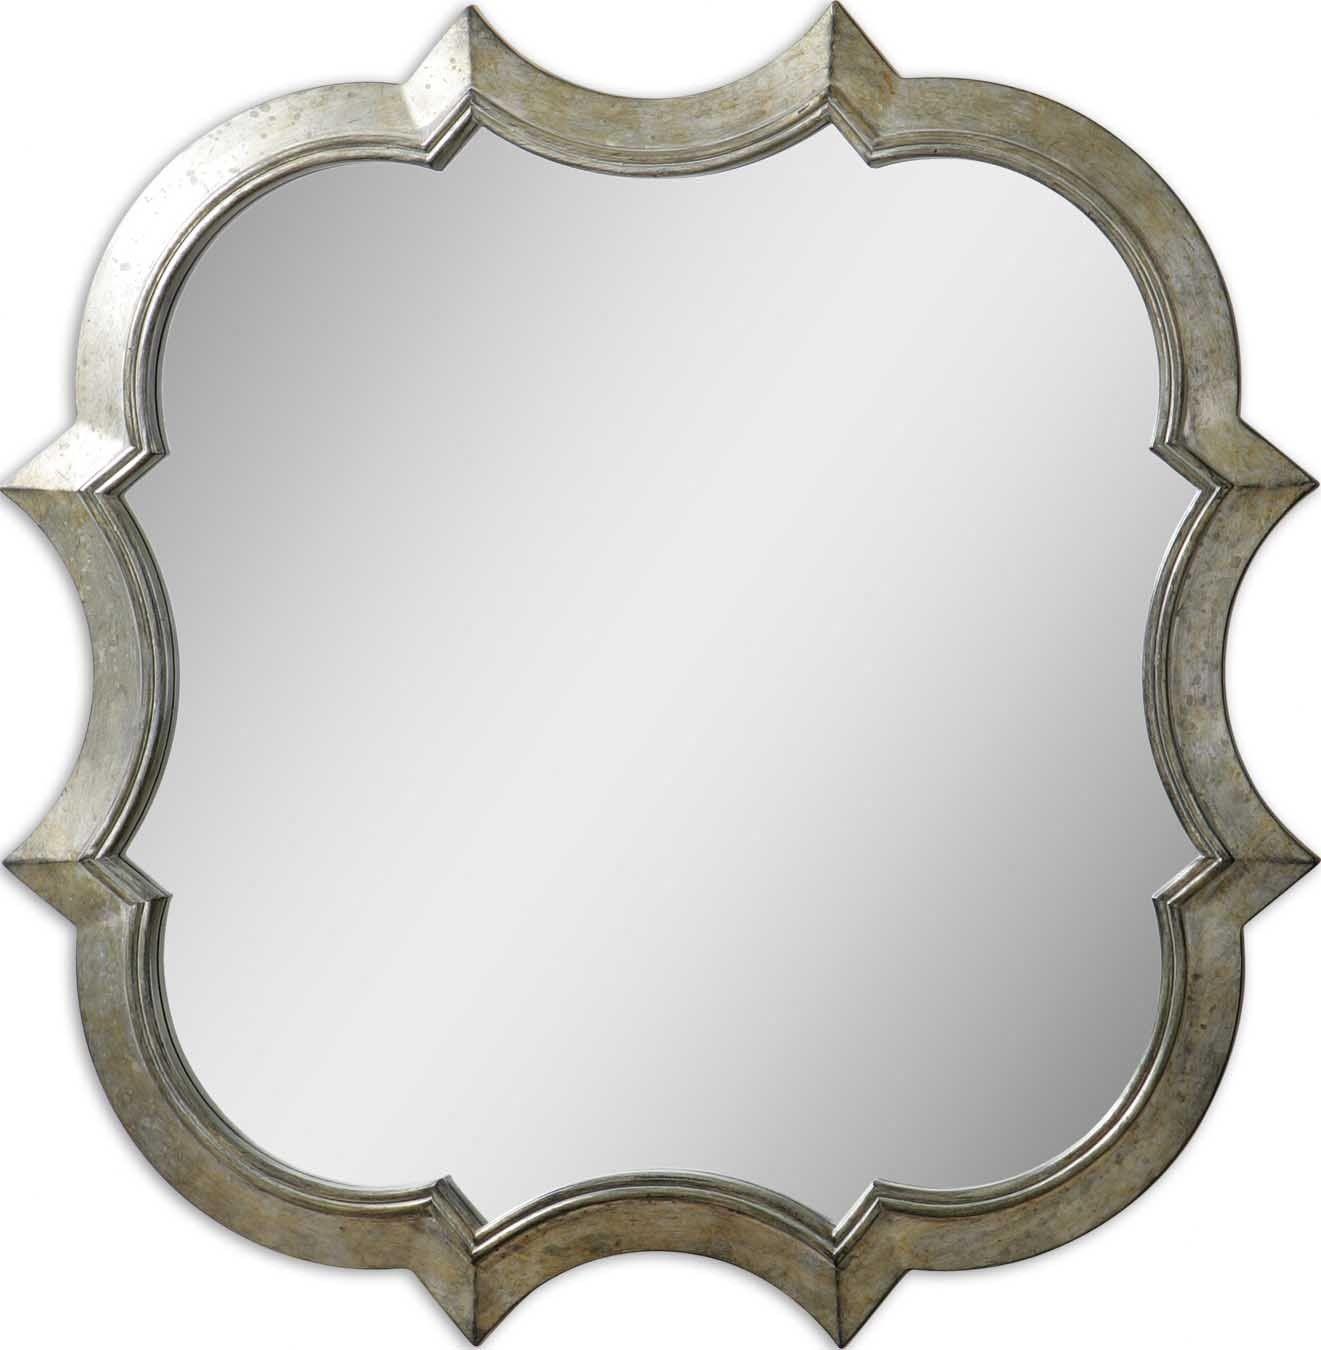 Superior Uttermost Farista Mirrors | Wayfair Home Design Ideas